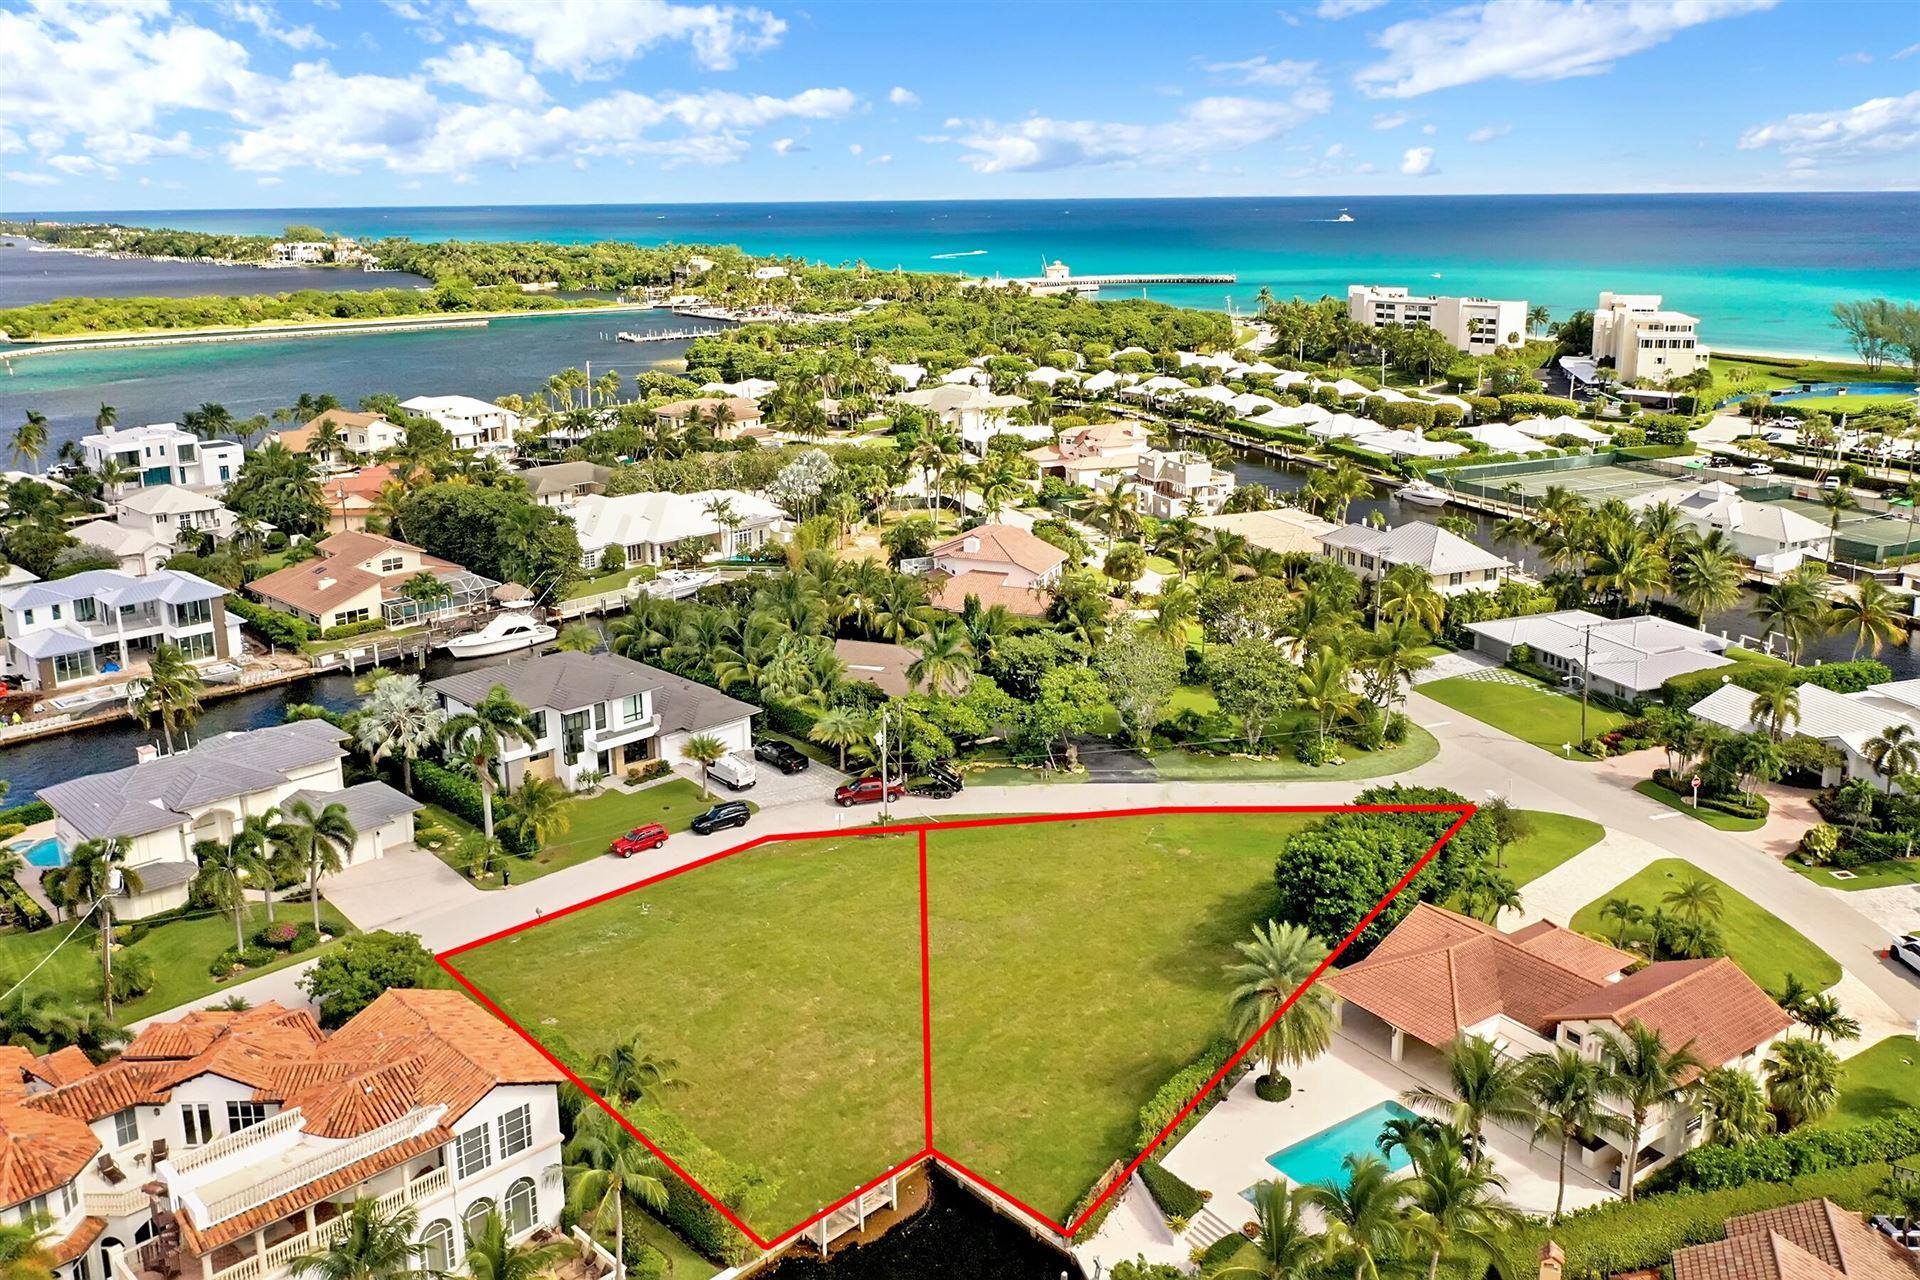 MC CORMICK MILE ADD 1 Properties For Sale